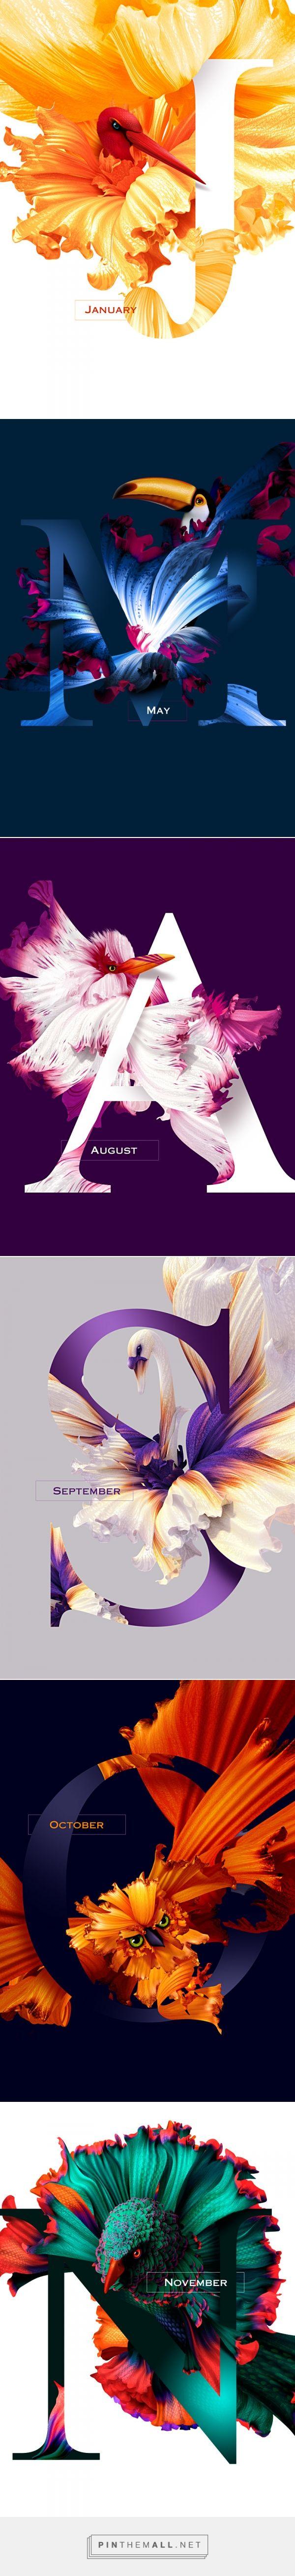 Flying Flowers 2016 by Artur Szygulski on Behance  | Fivestar Branding – Design and Branding Agency & Inspiration Gallery